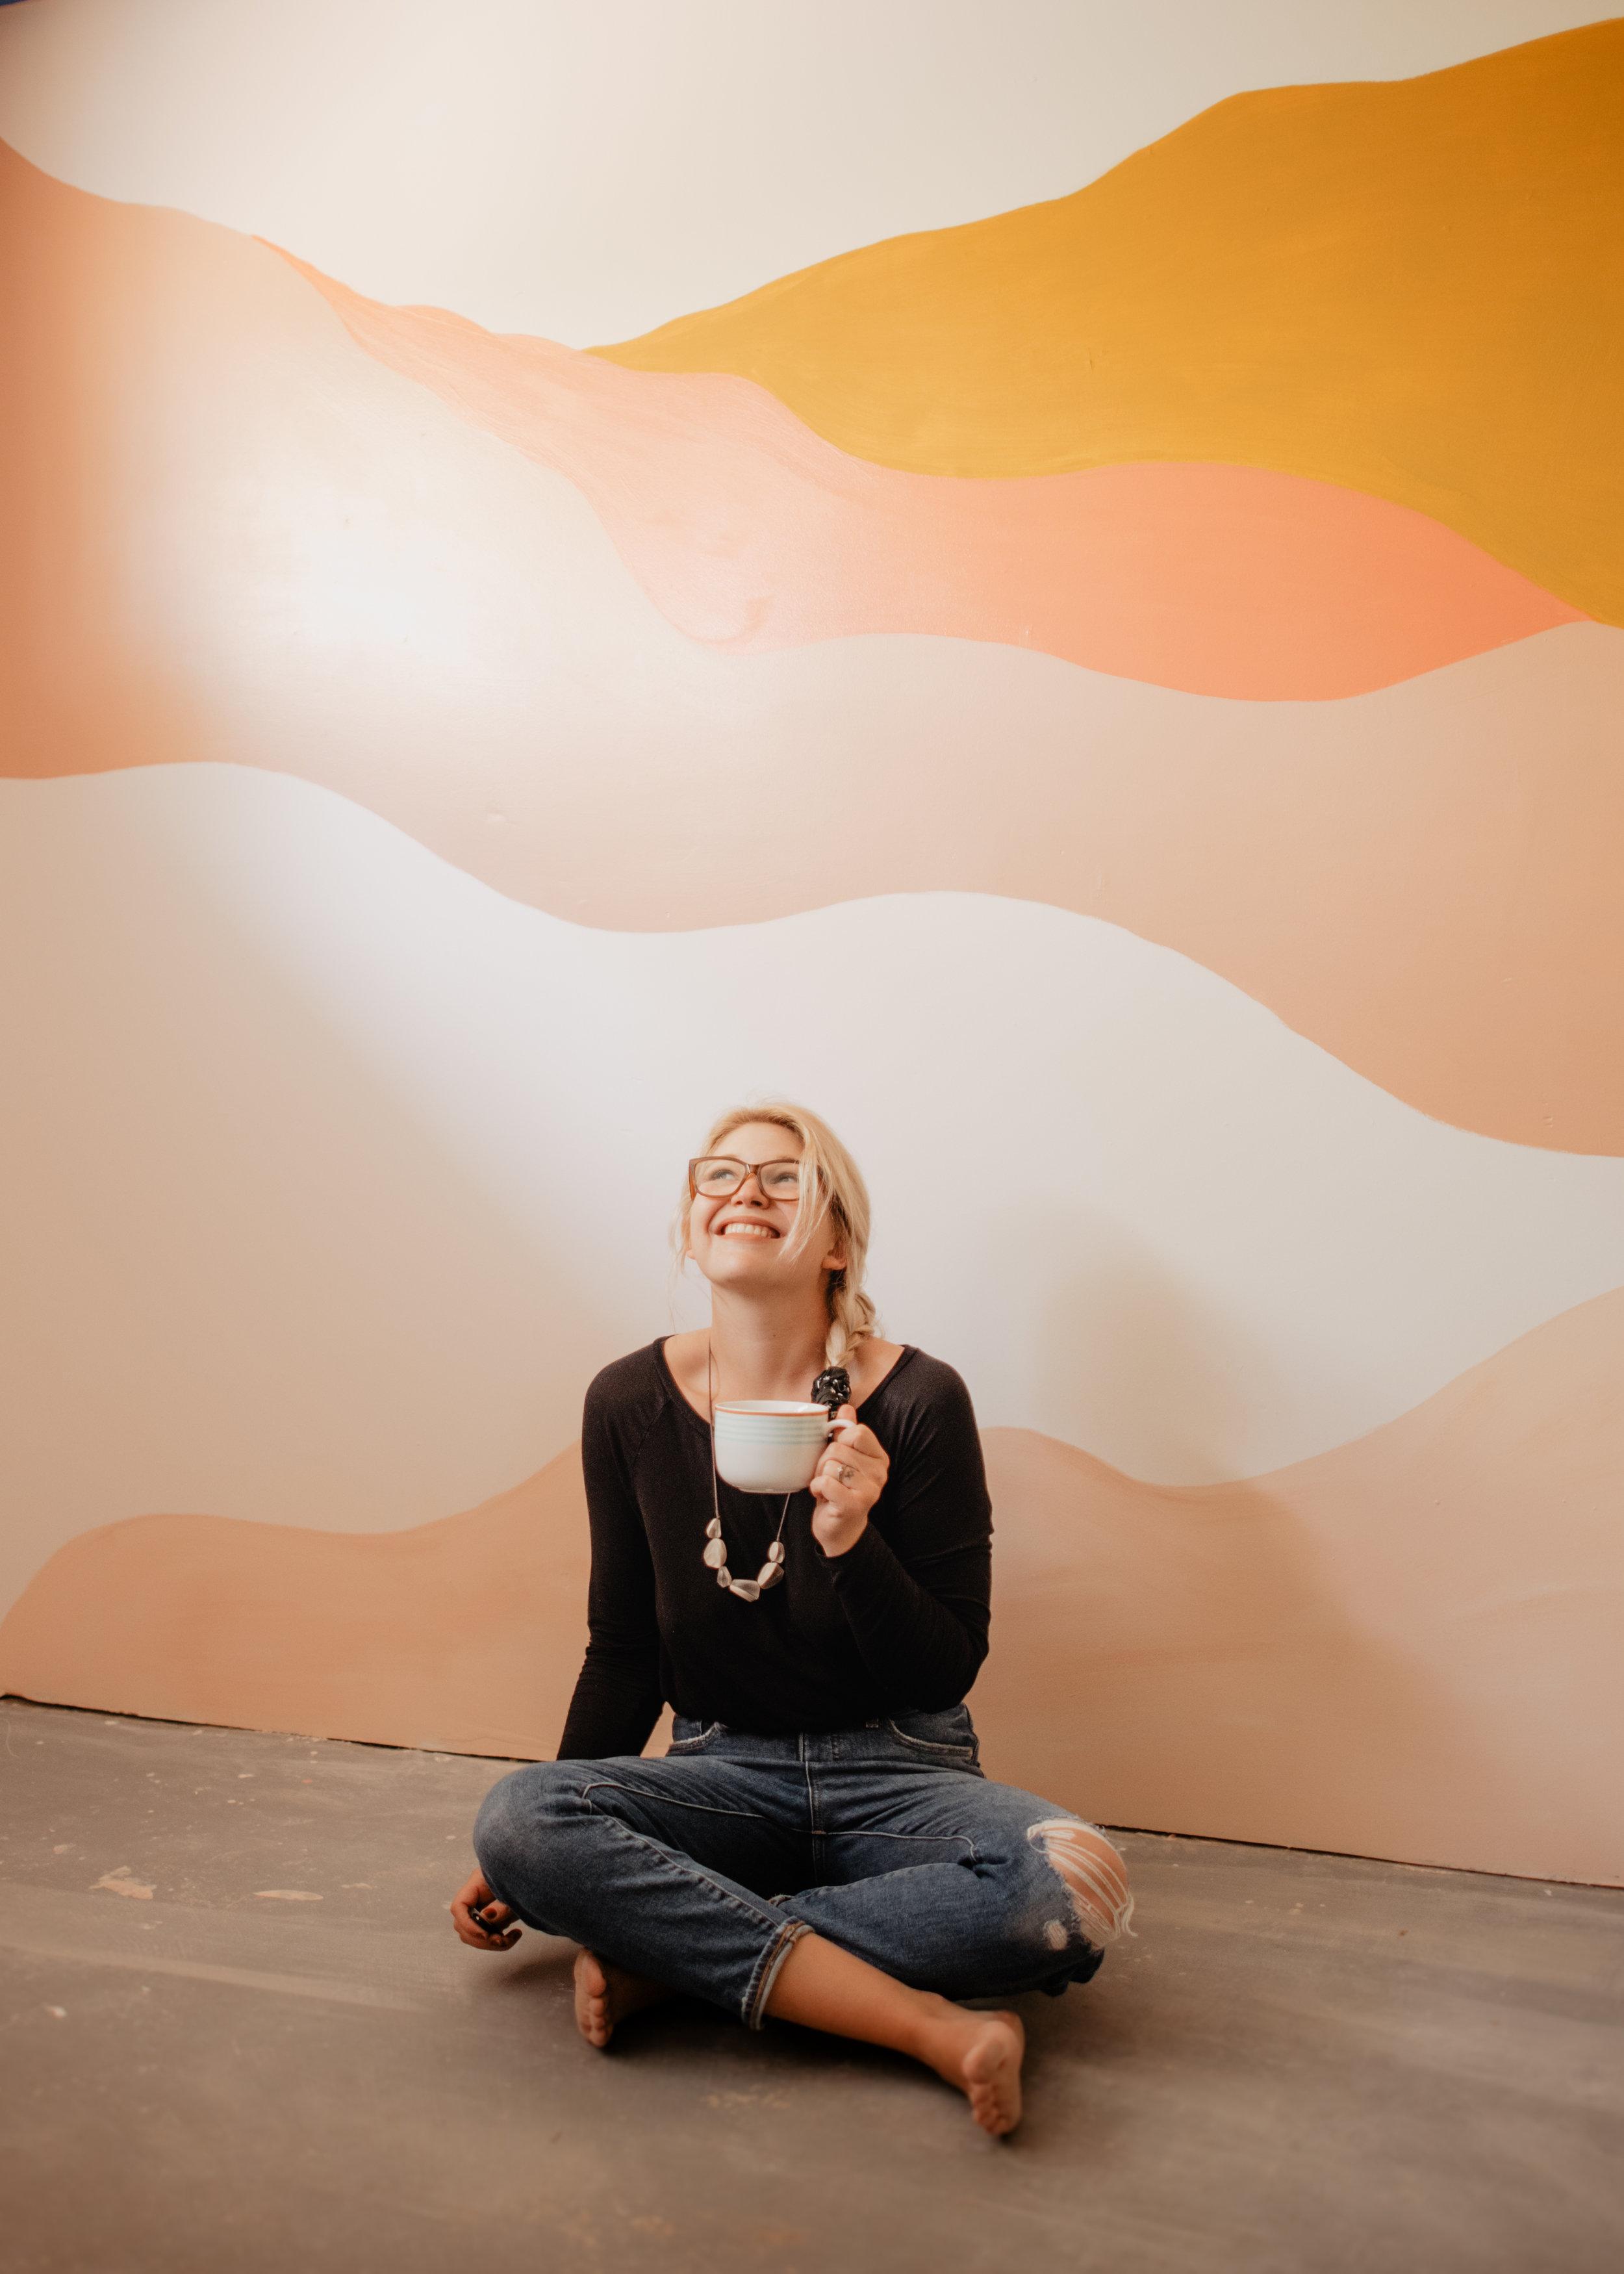 Heathers-Wall-Mural-5.jpg